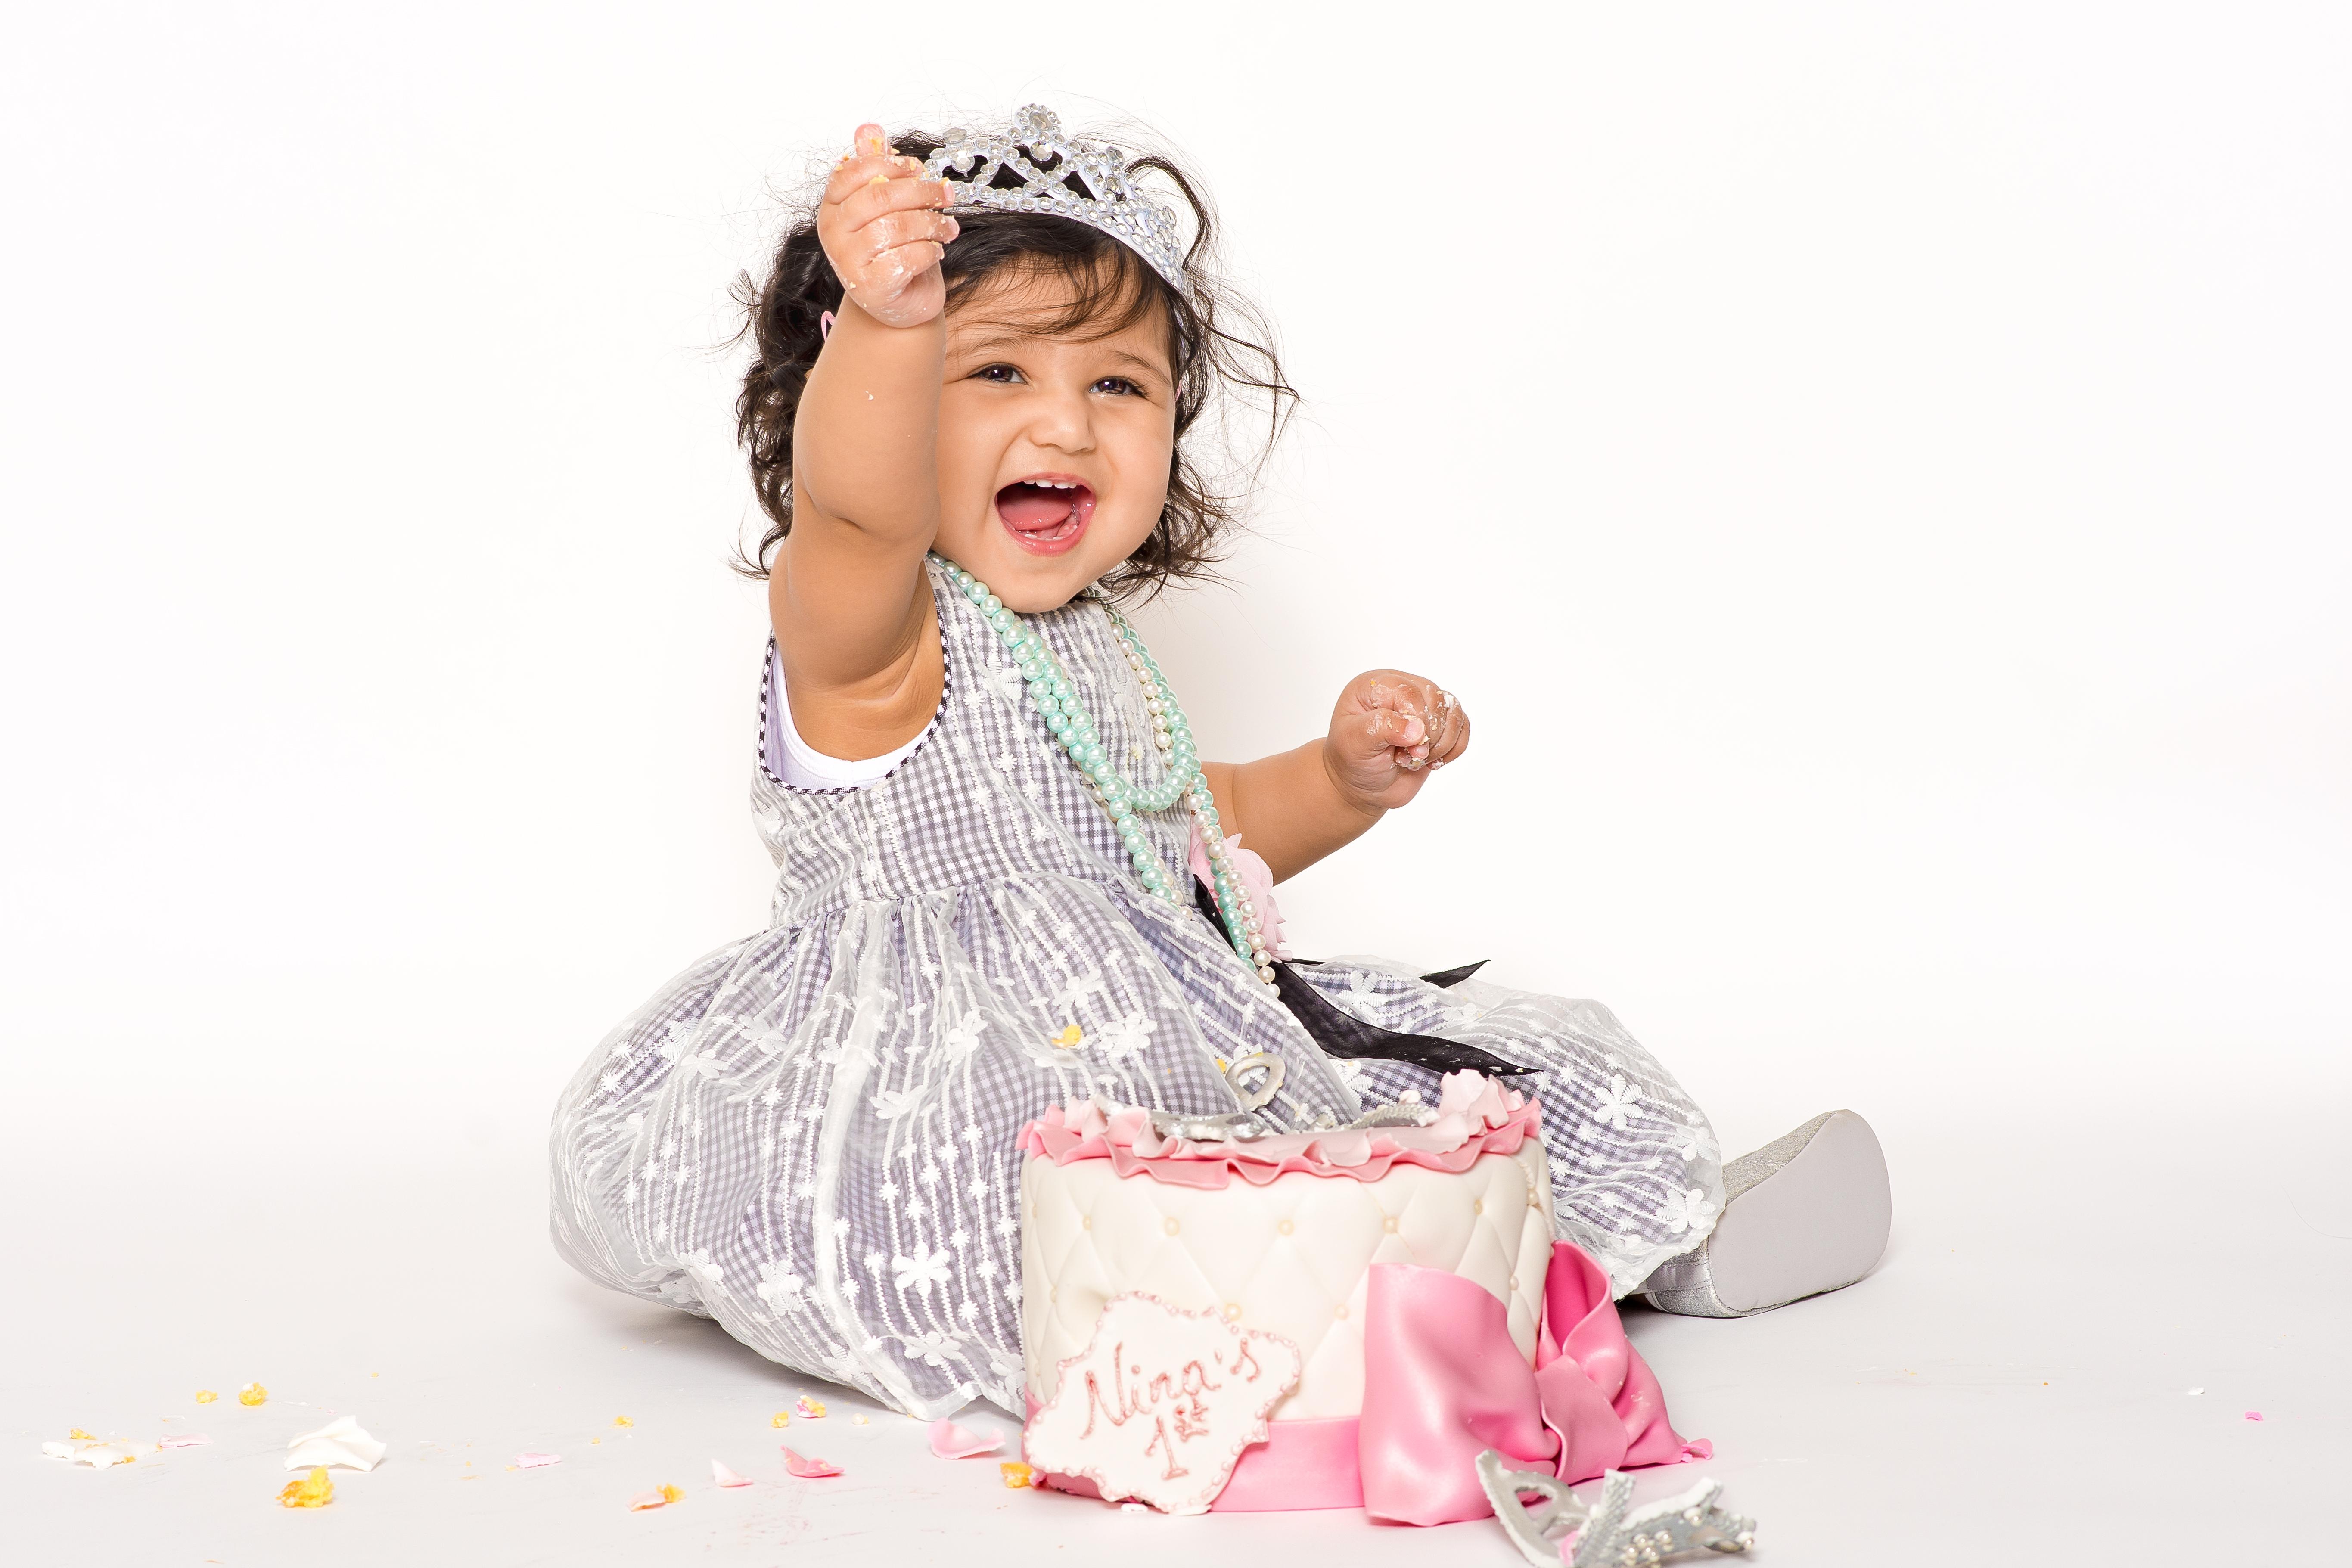 Ninas 1st Birthday